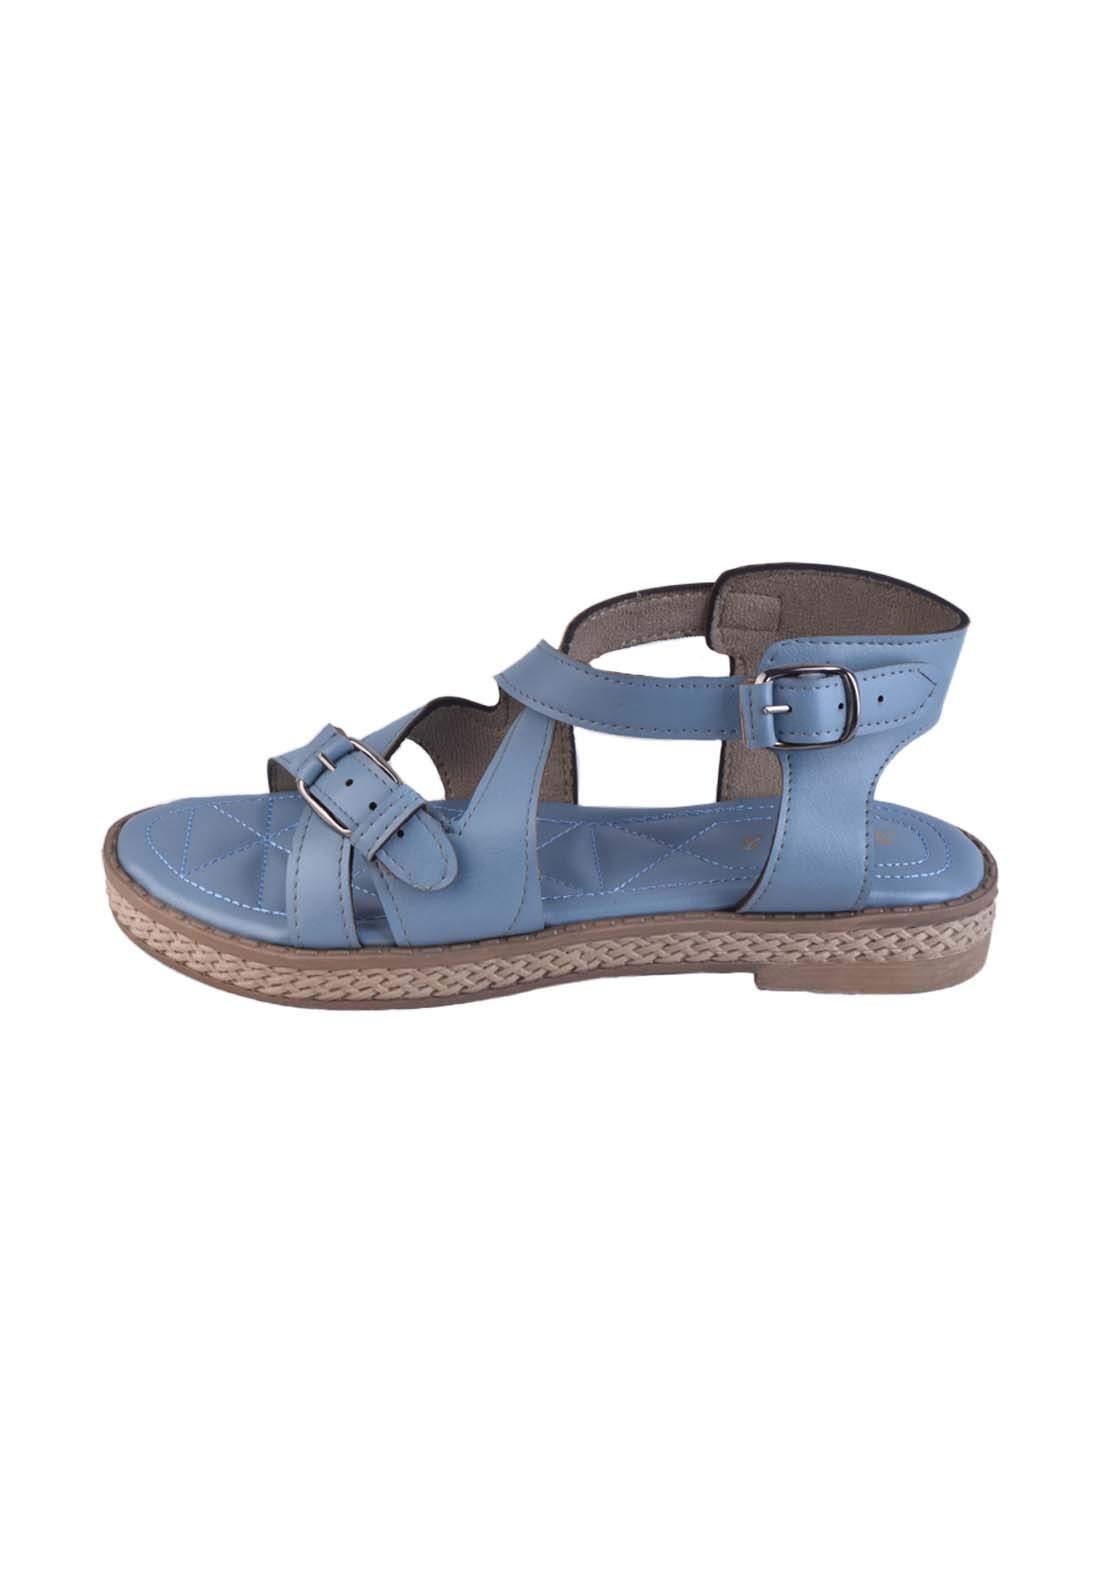 حذاء نسائي ازرق اللون